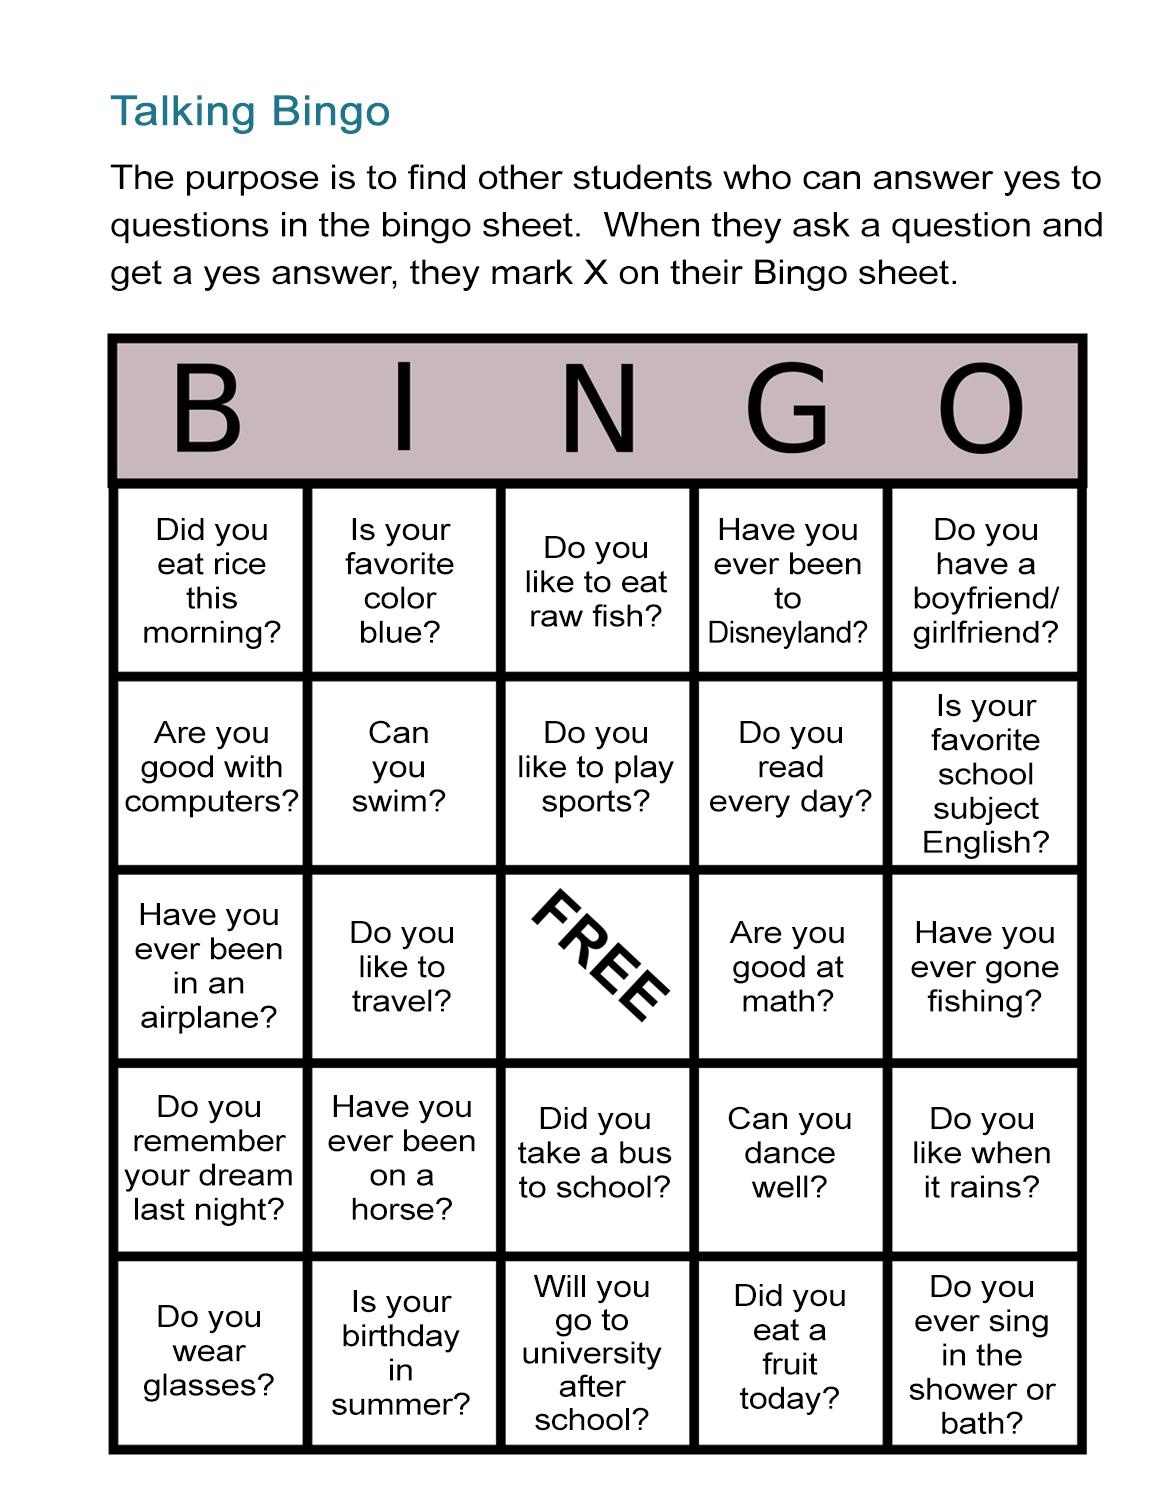 Esl Bingo Free Worksheet: Stand-Up Bingo - All Esl - Free Printable English Lessons